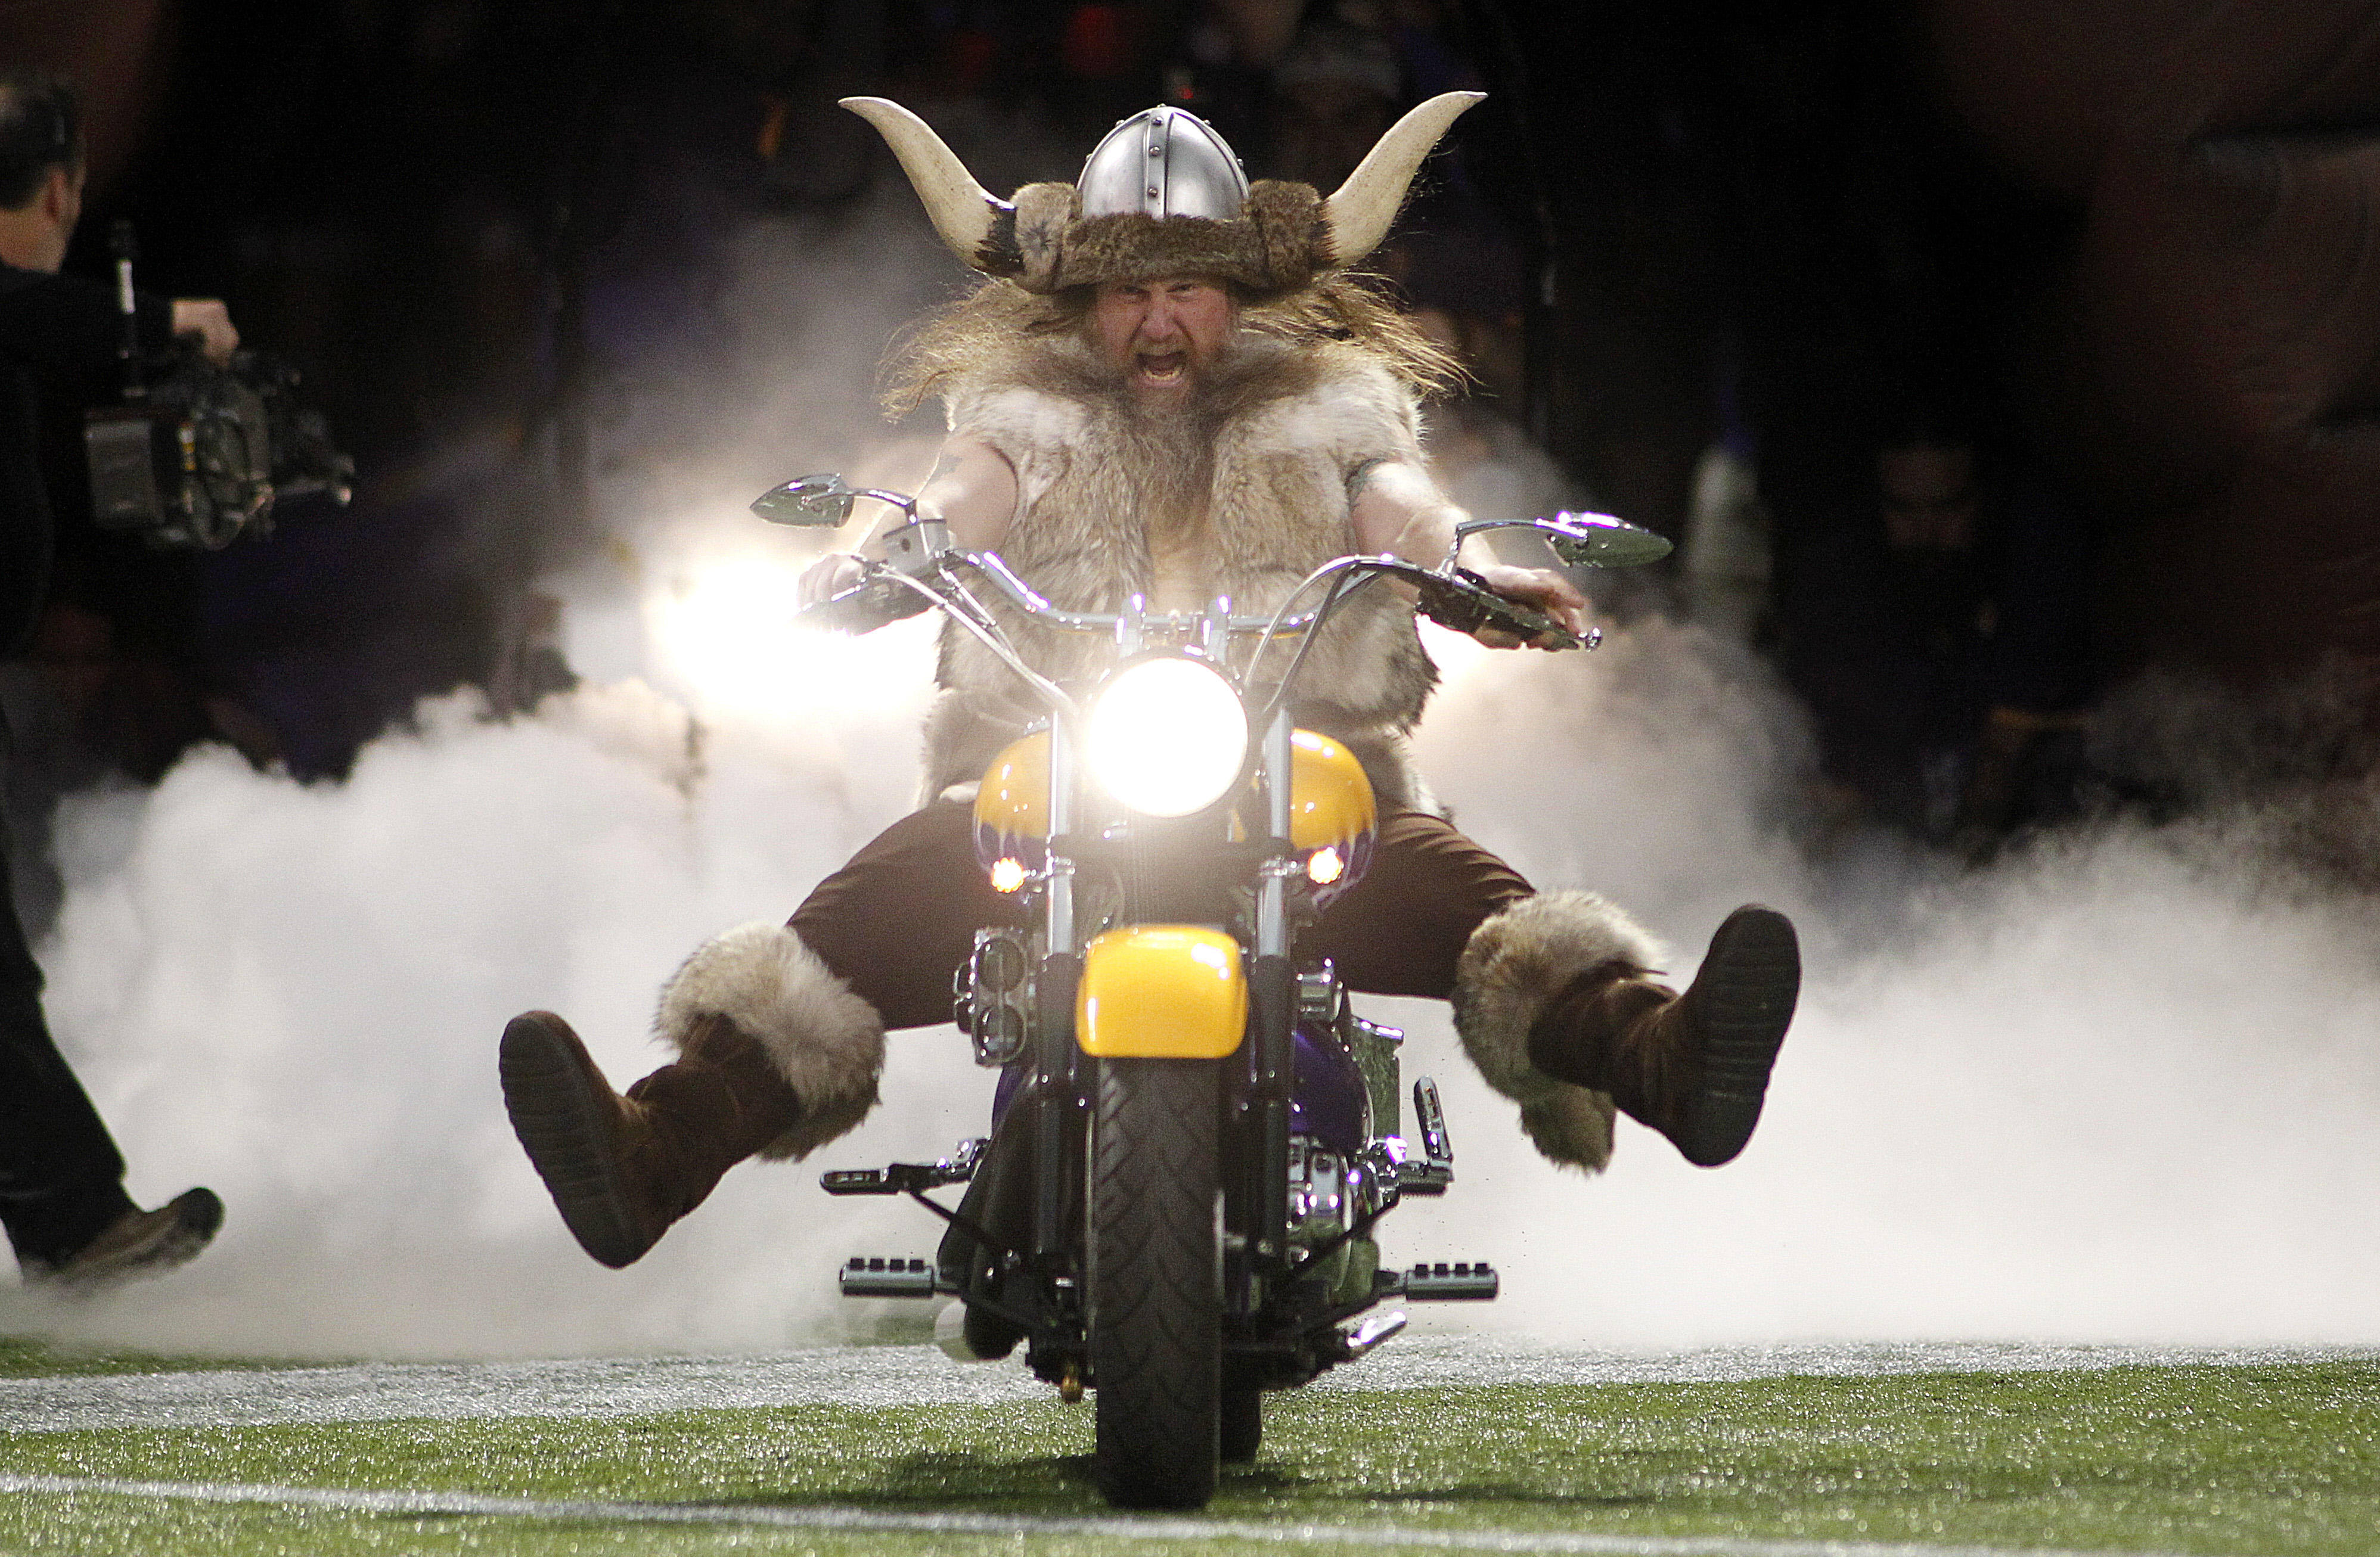 Ragnar No Longer Vikings Mascot After Contract Dispute The